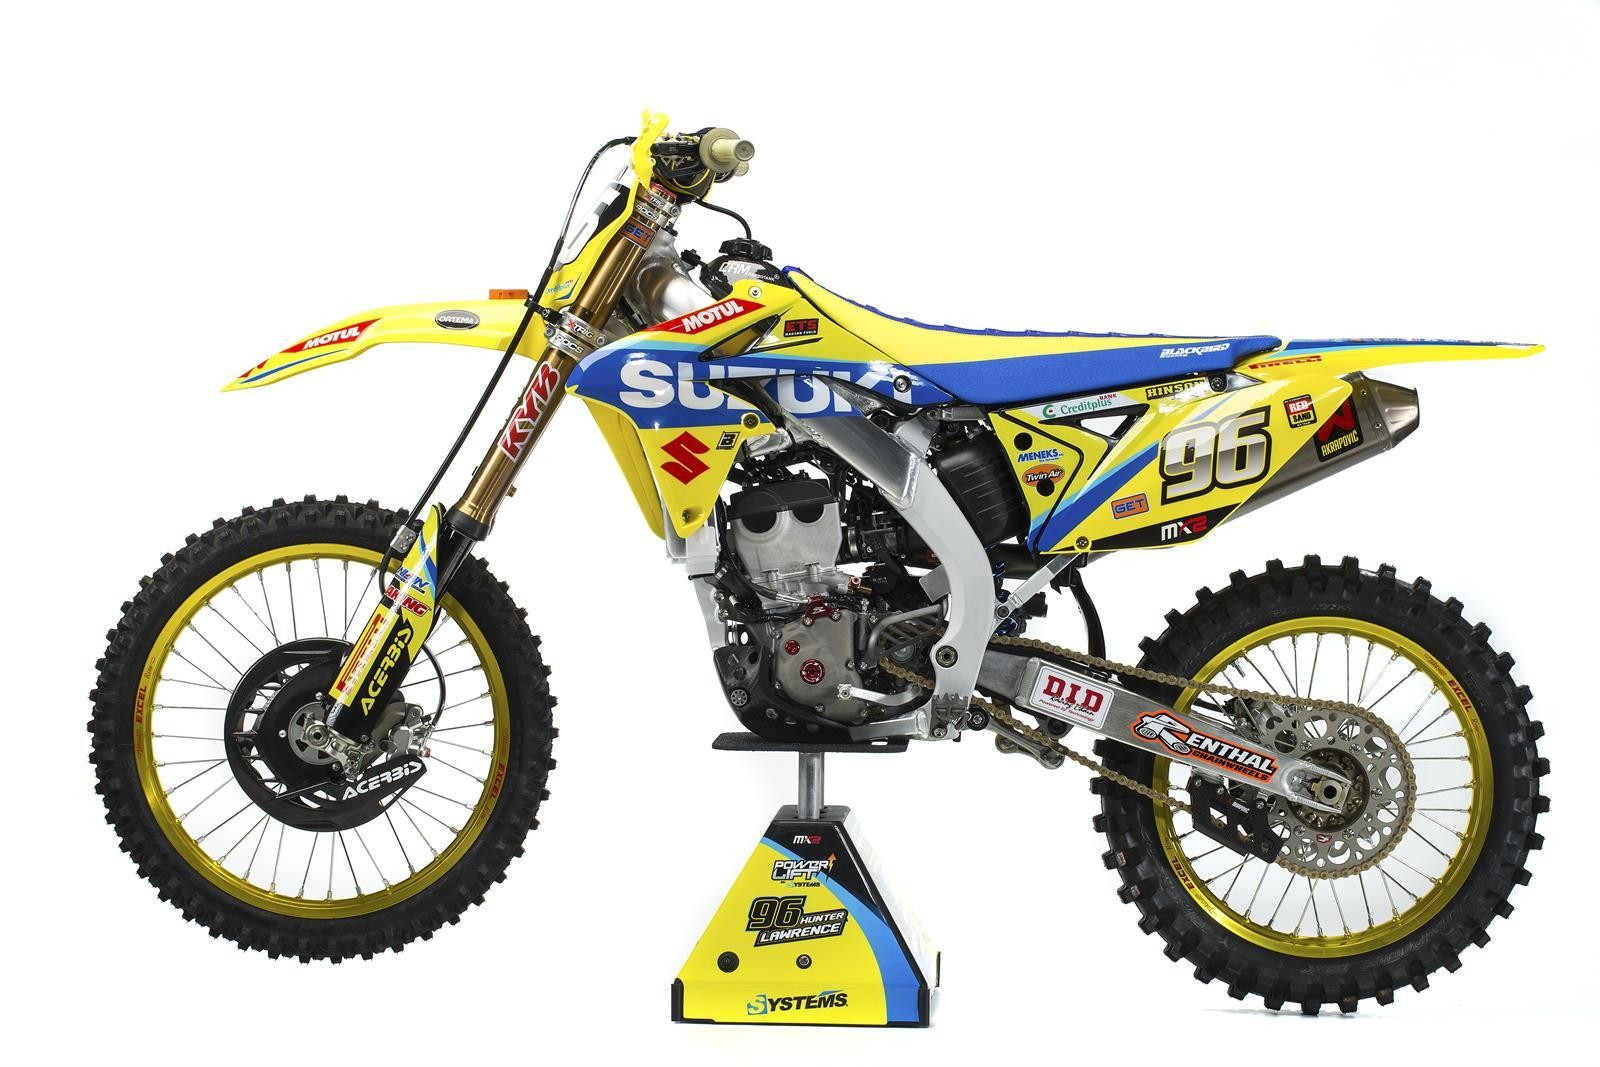 Hunter Lawrence's 2017 Suzuki World MX2 RM-Z250 - First Look: 2017 Suzuki World MX2 Team - Motocross Pictures - Vital MX